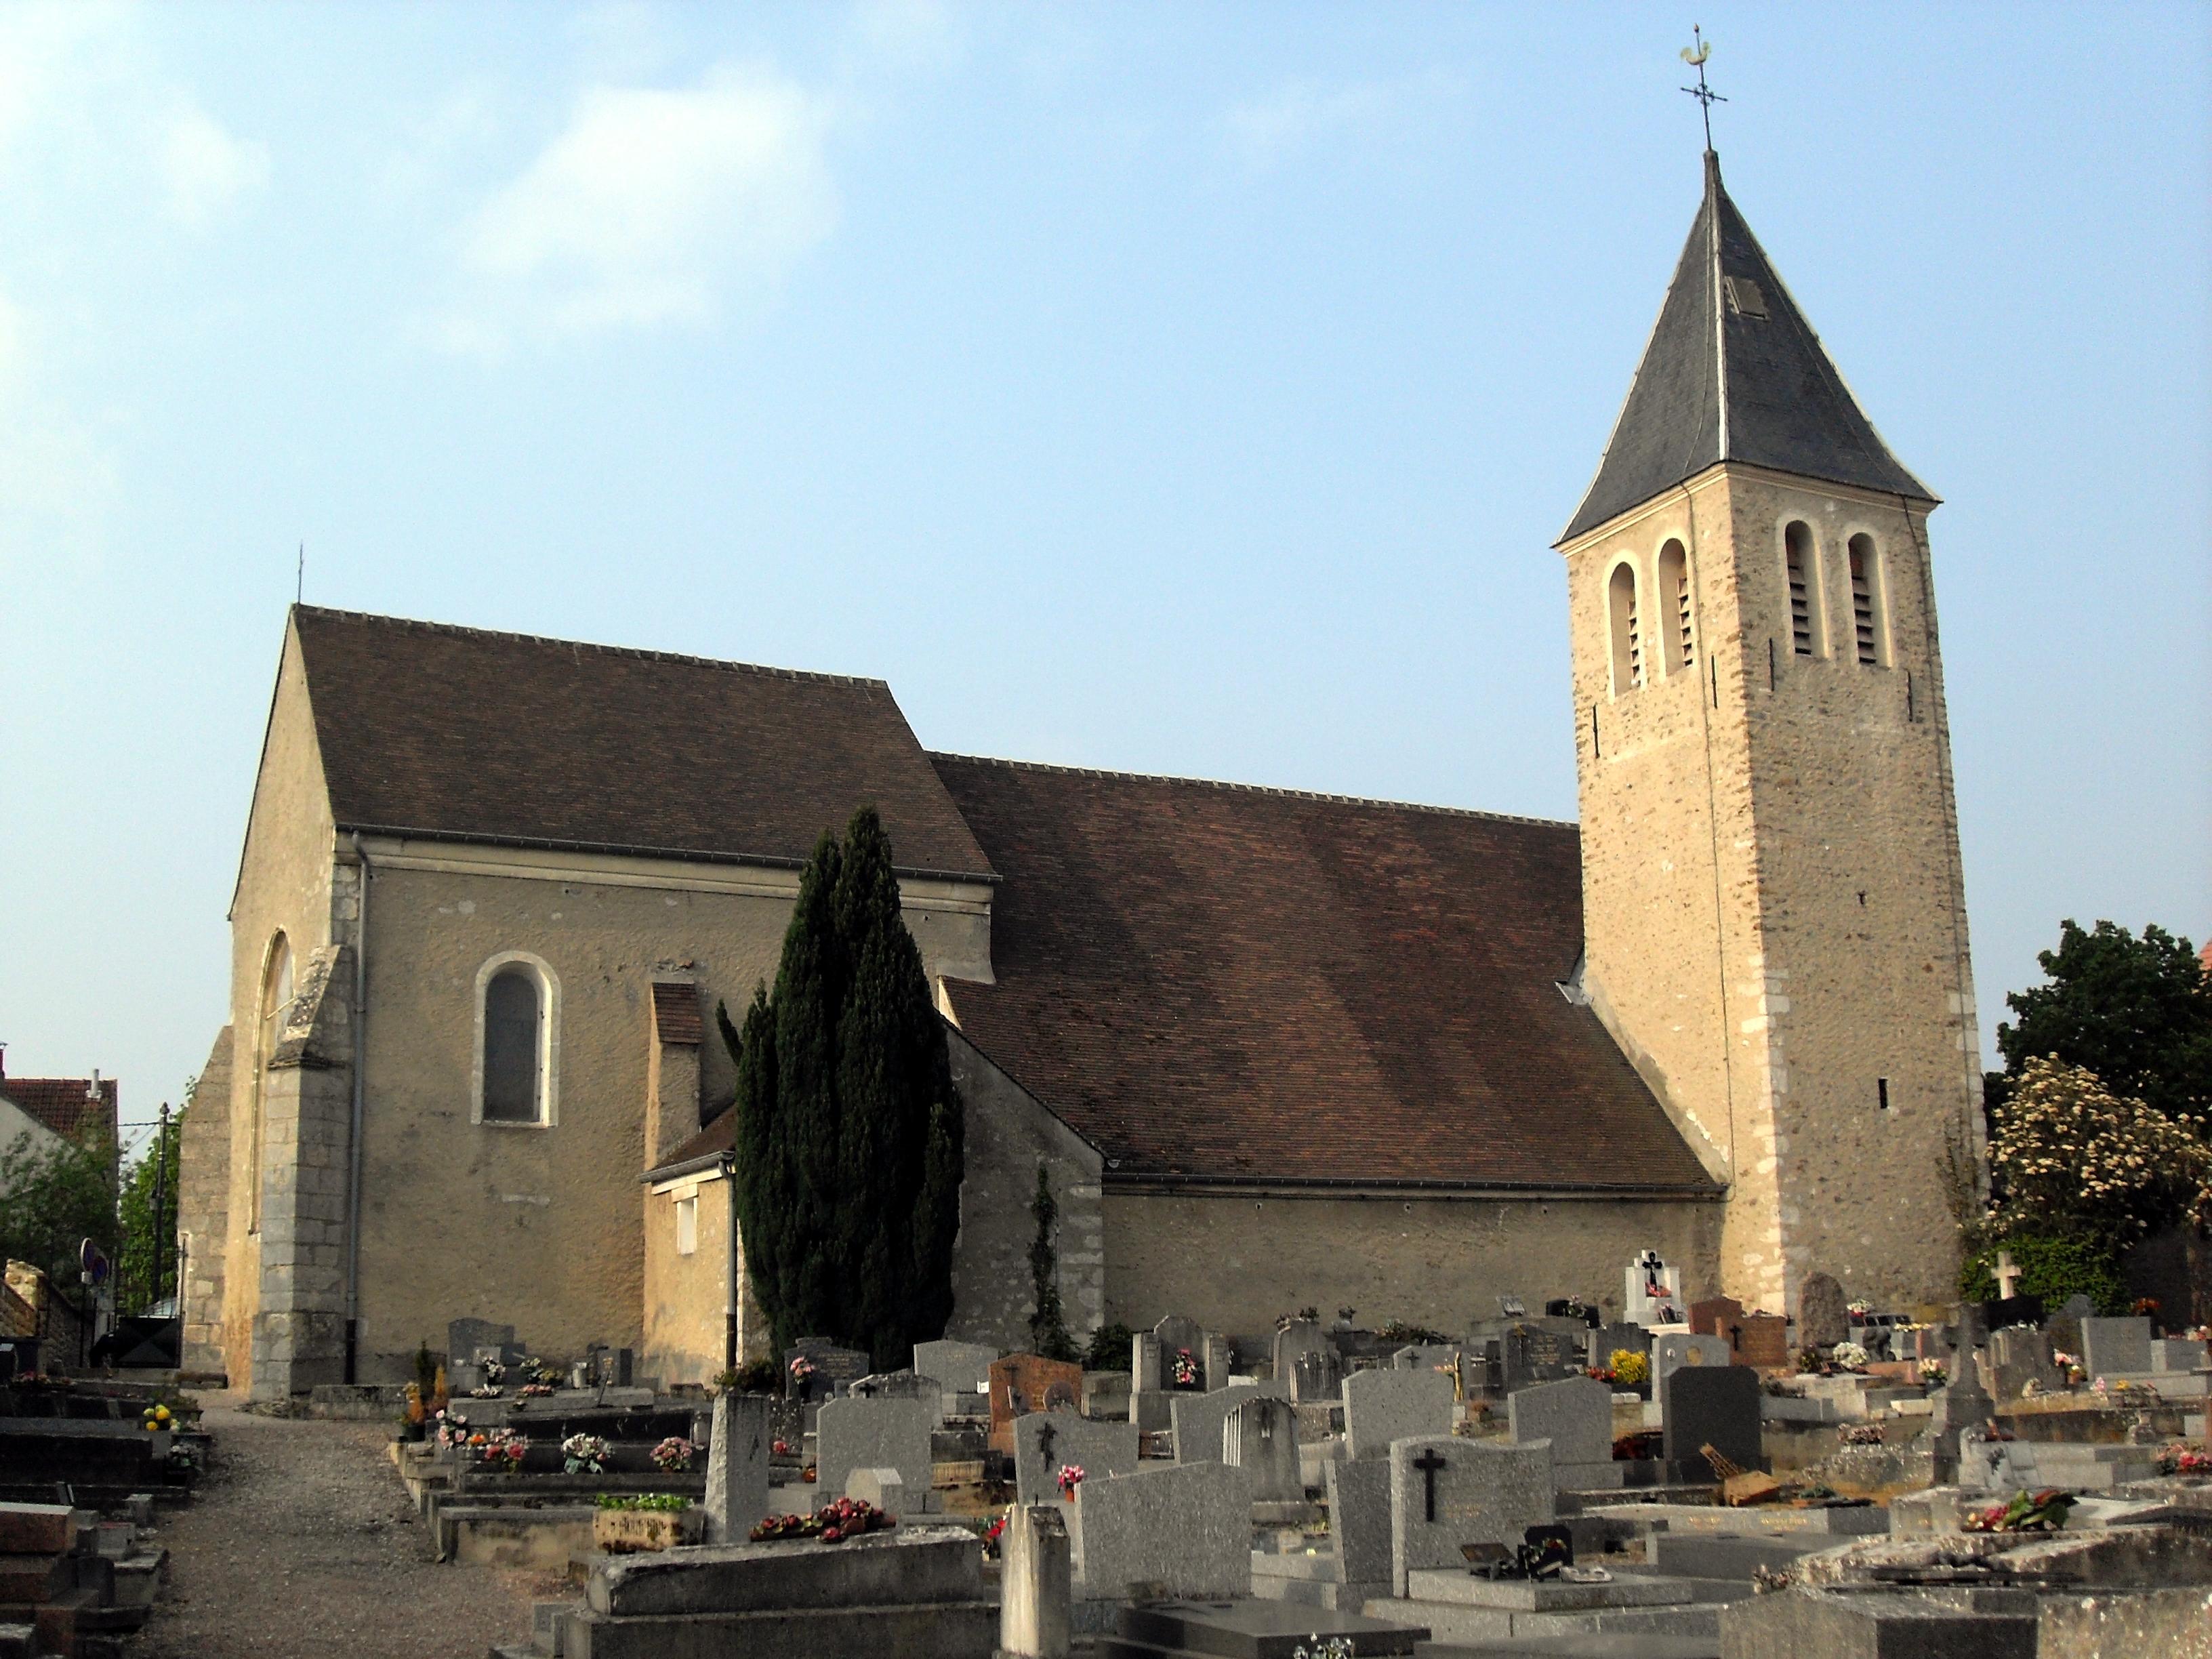 File Les Clayes sous Bois Eglise Saint Martin cimeti u00e8re jpg Wikimedia Commons # Ophtalmologue Les Clayes Sous Bois